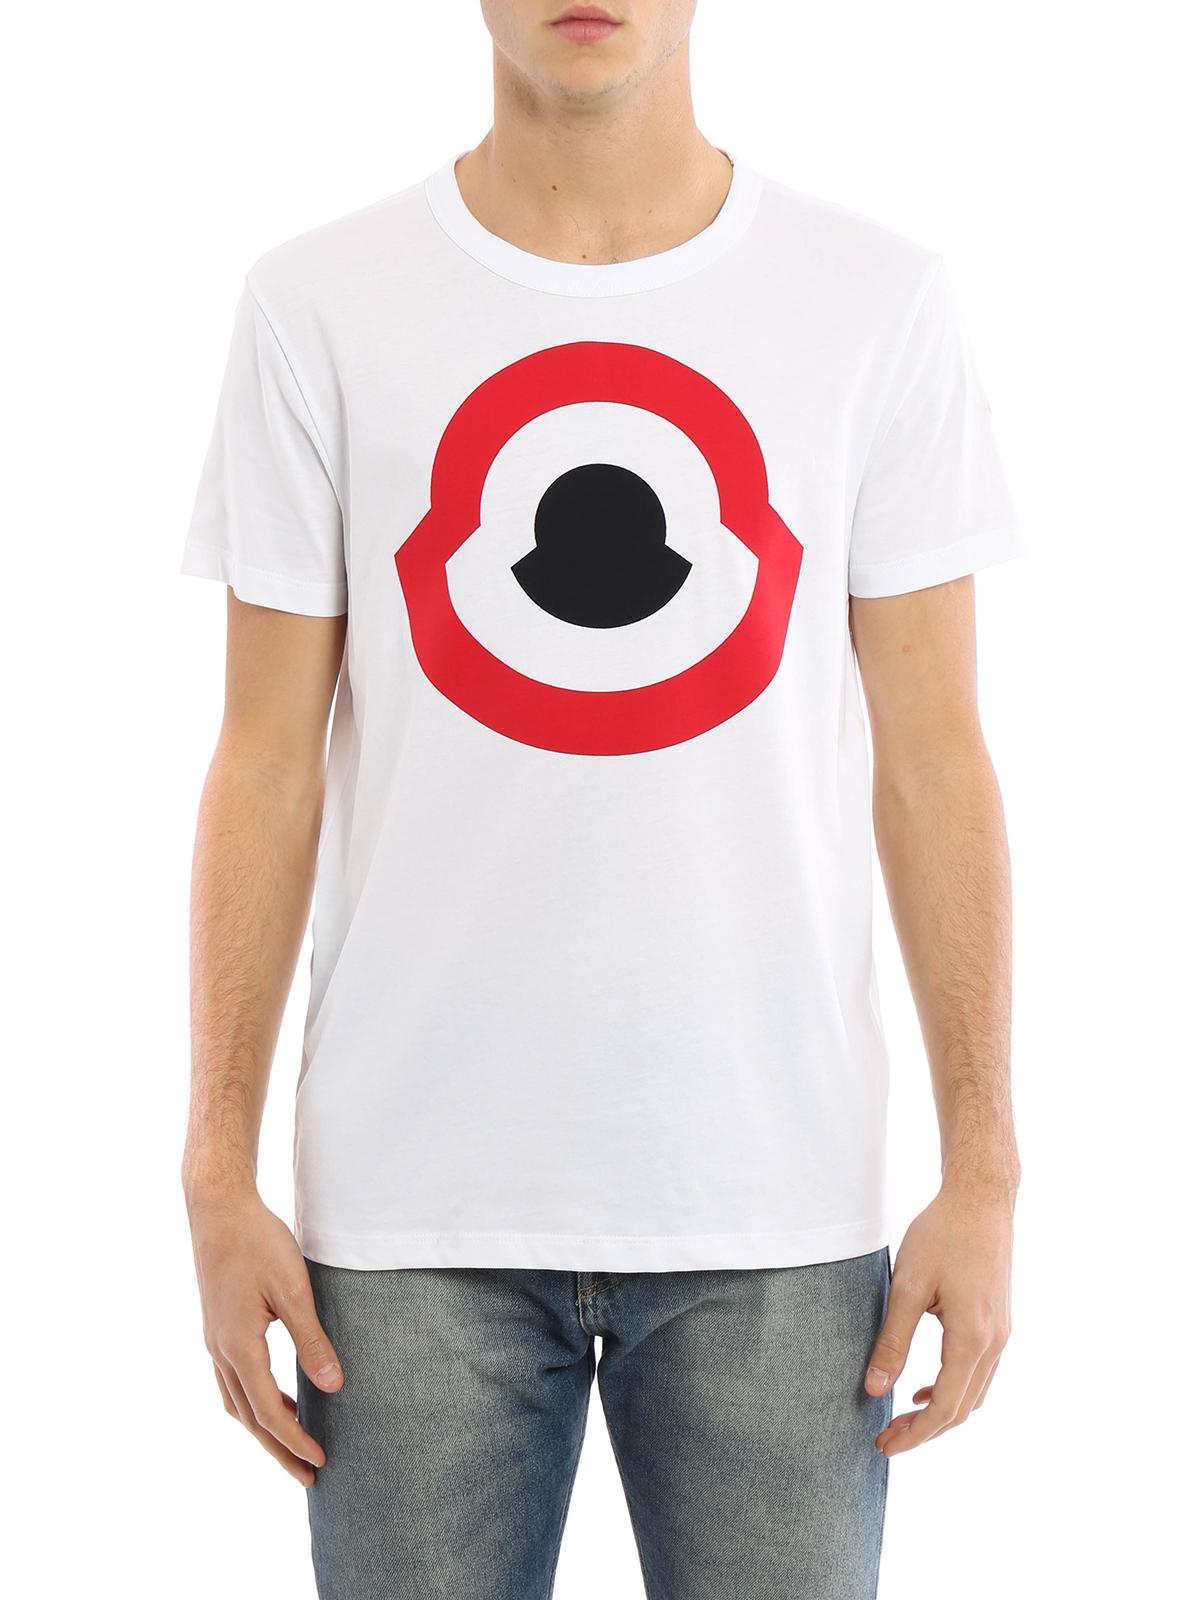 7800a9fe6 Moncler - Logo print T-shirt - t-shirts - C1 091 8020350 82565 001